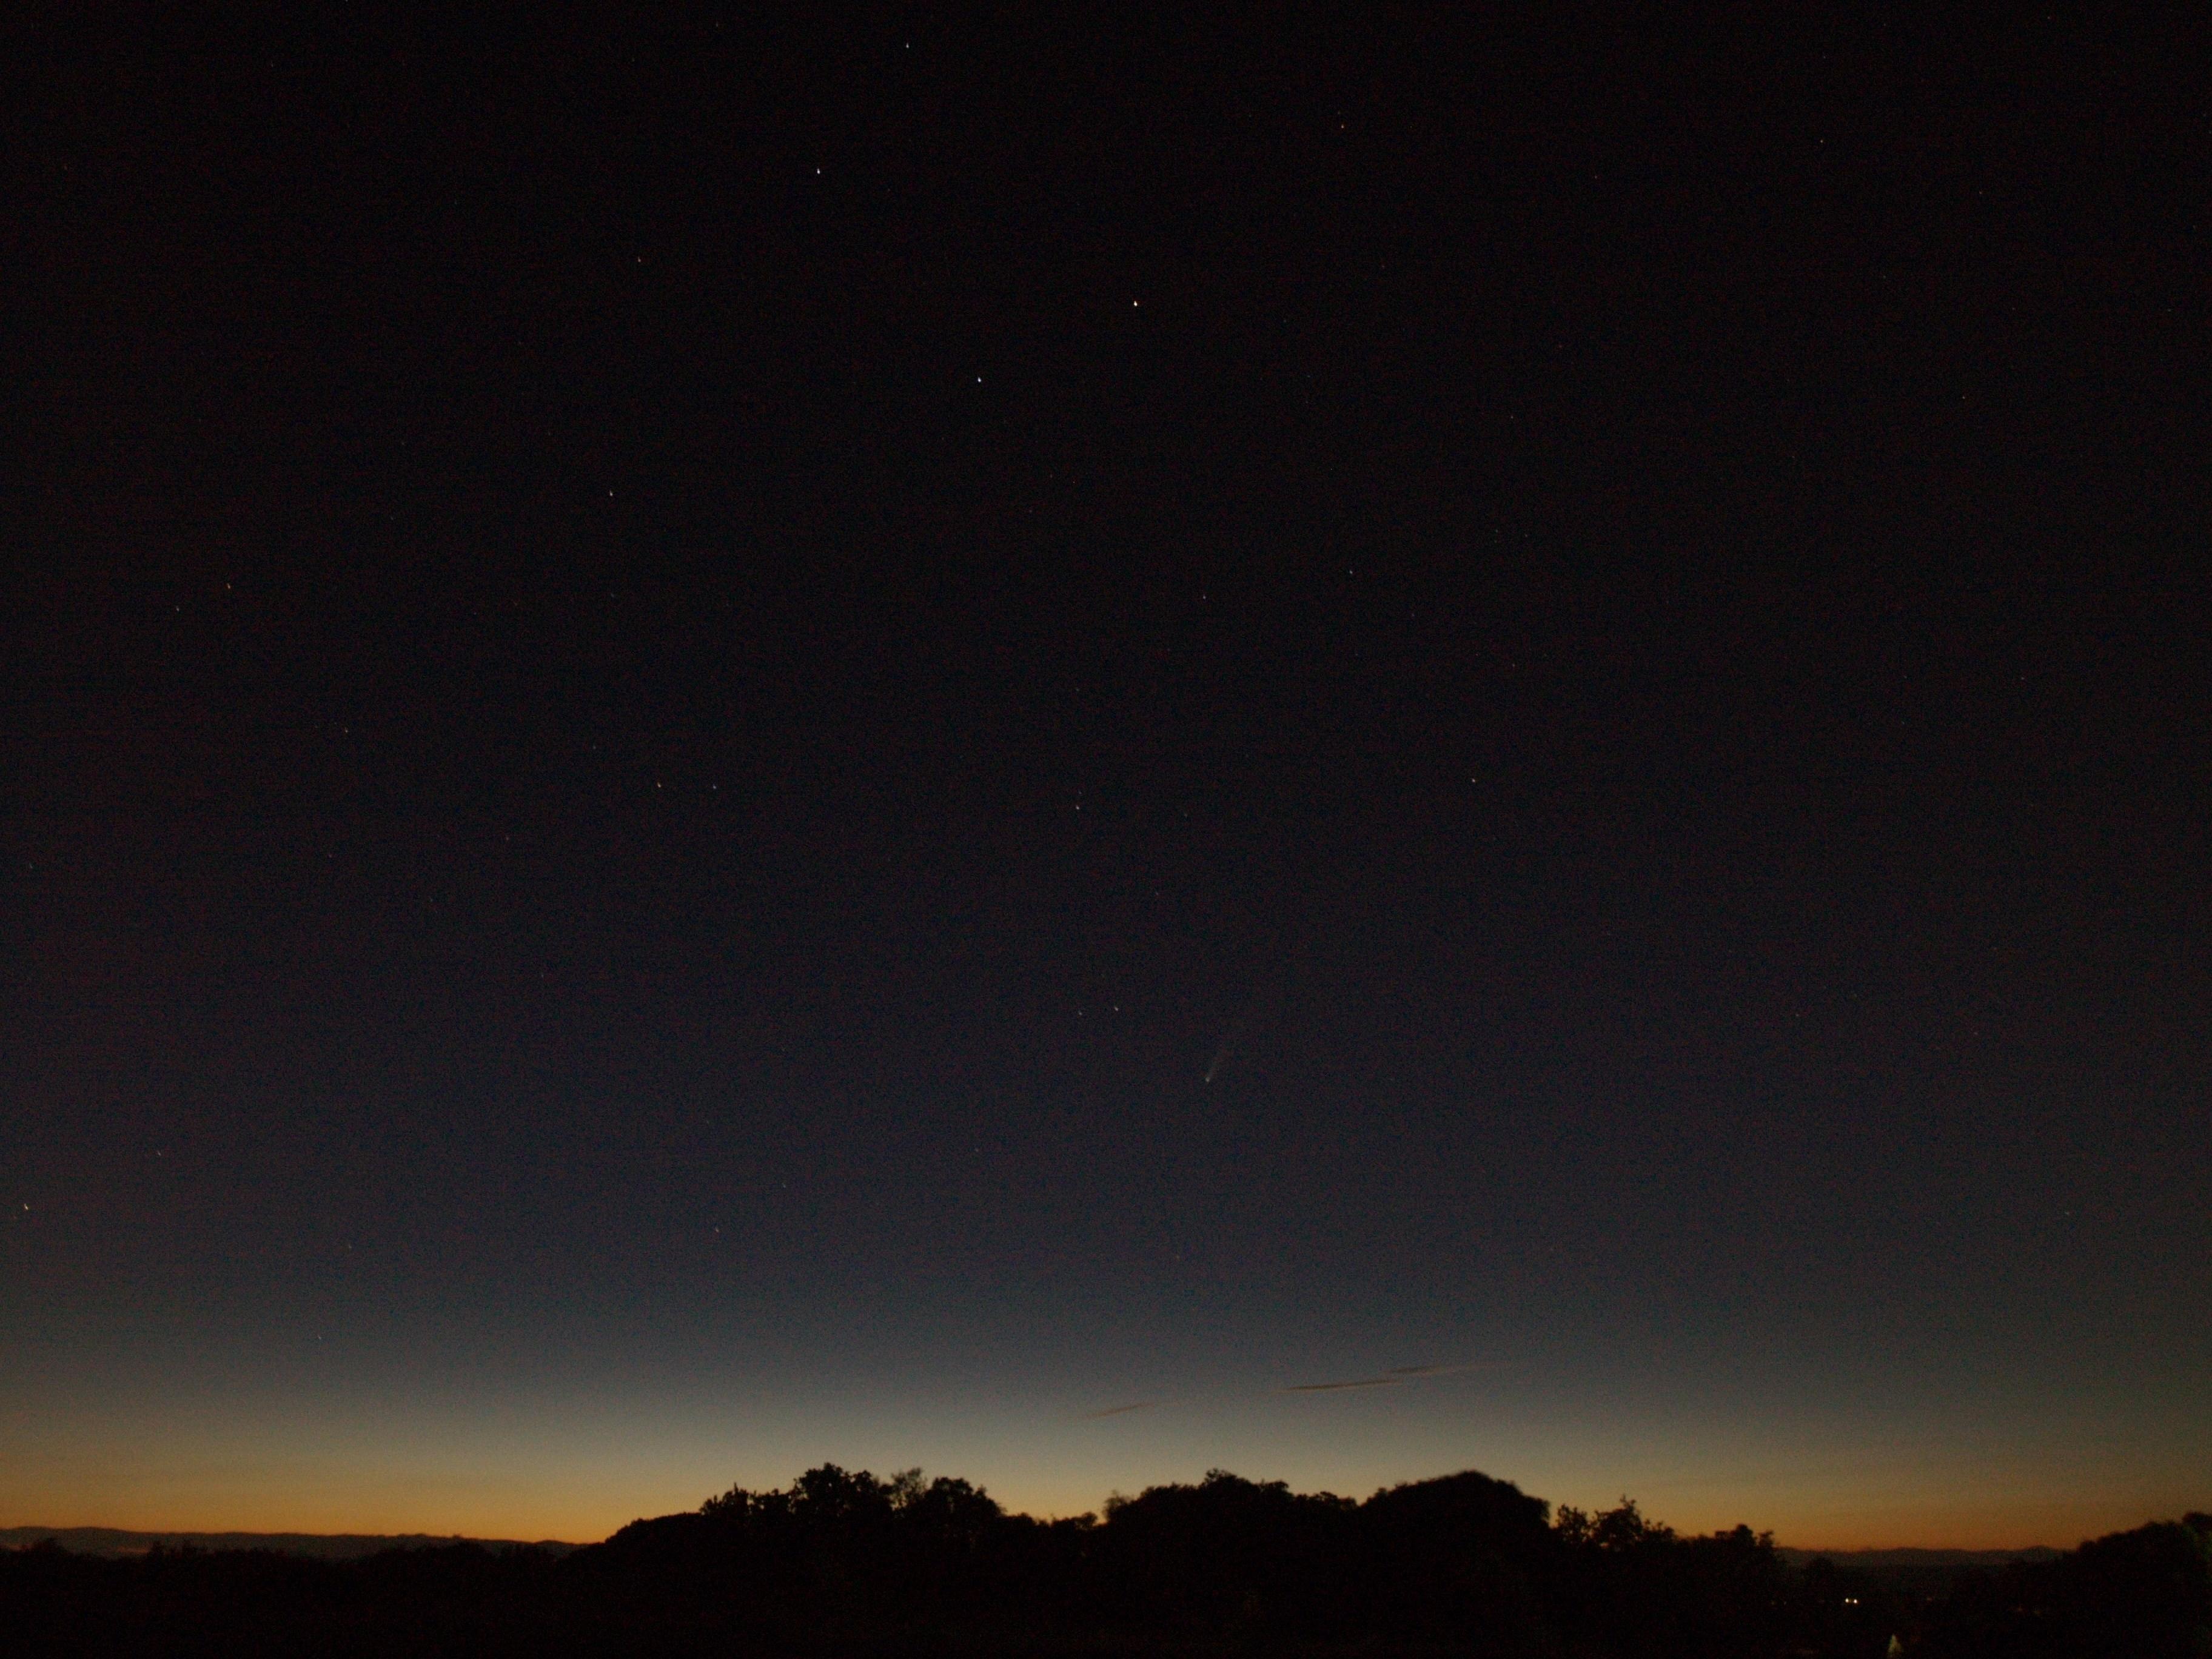 COMETE NEOWISE 19 07 2020